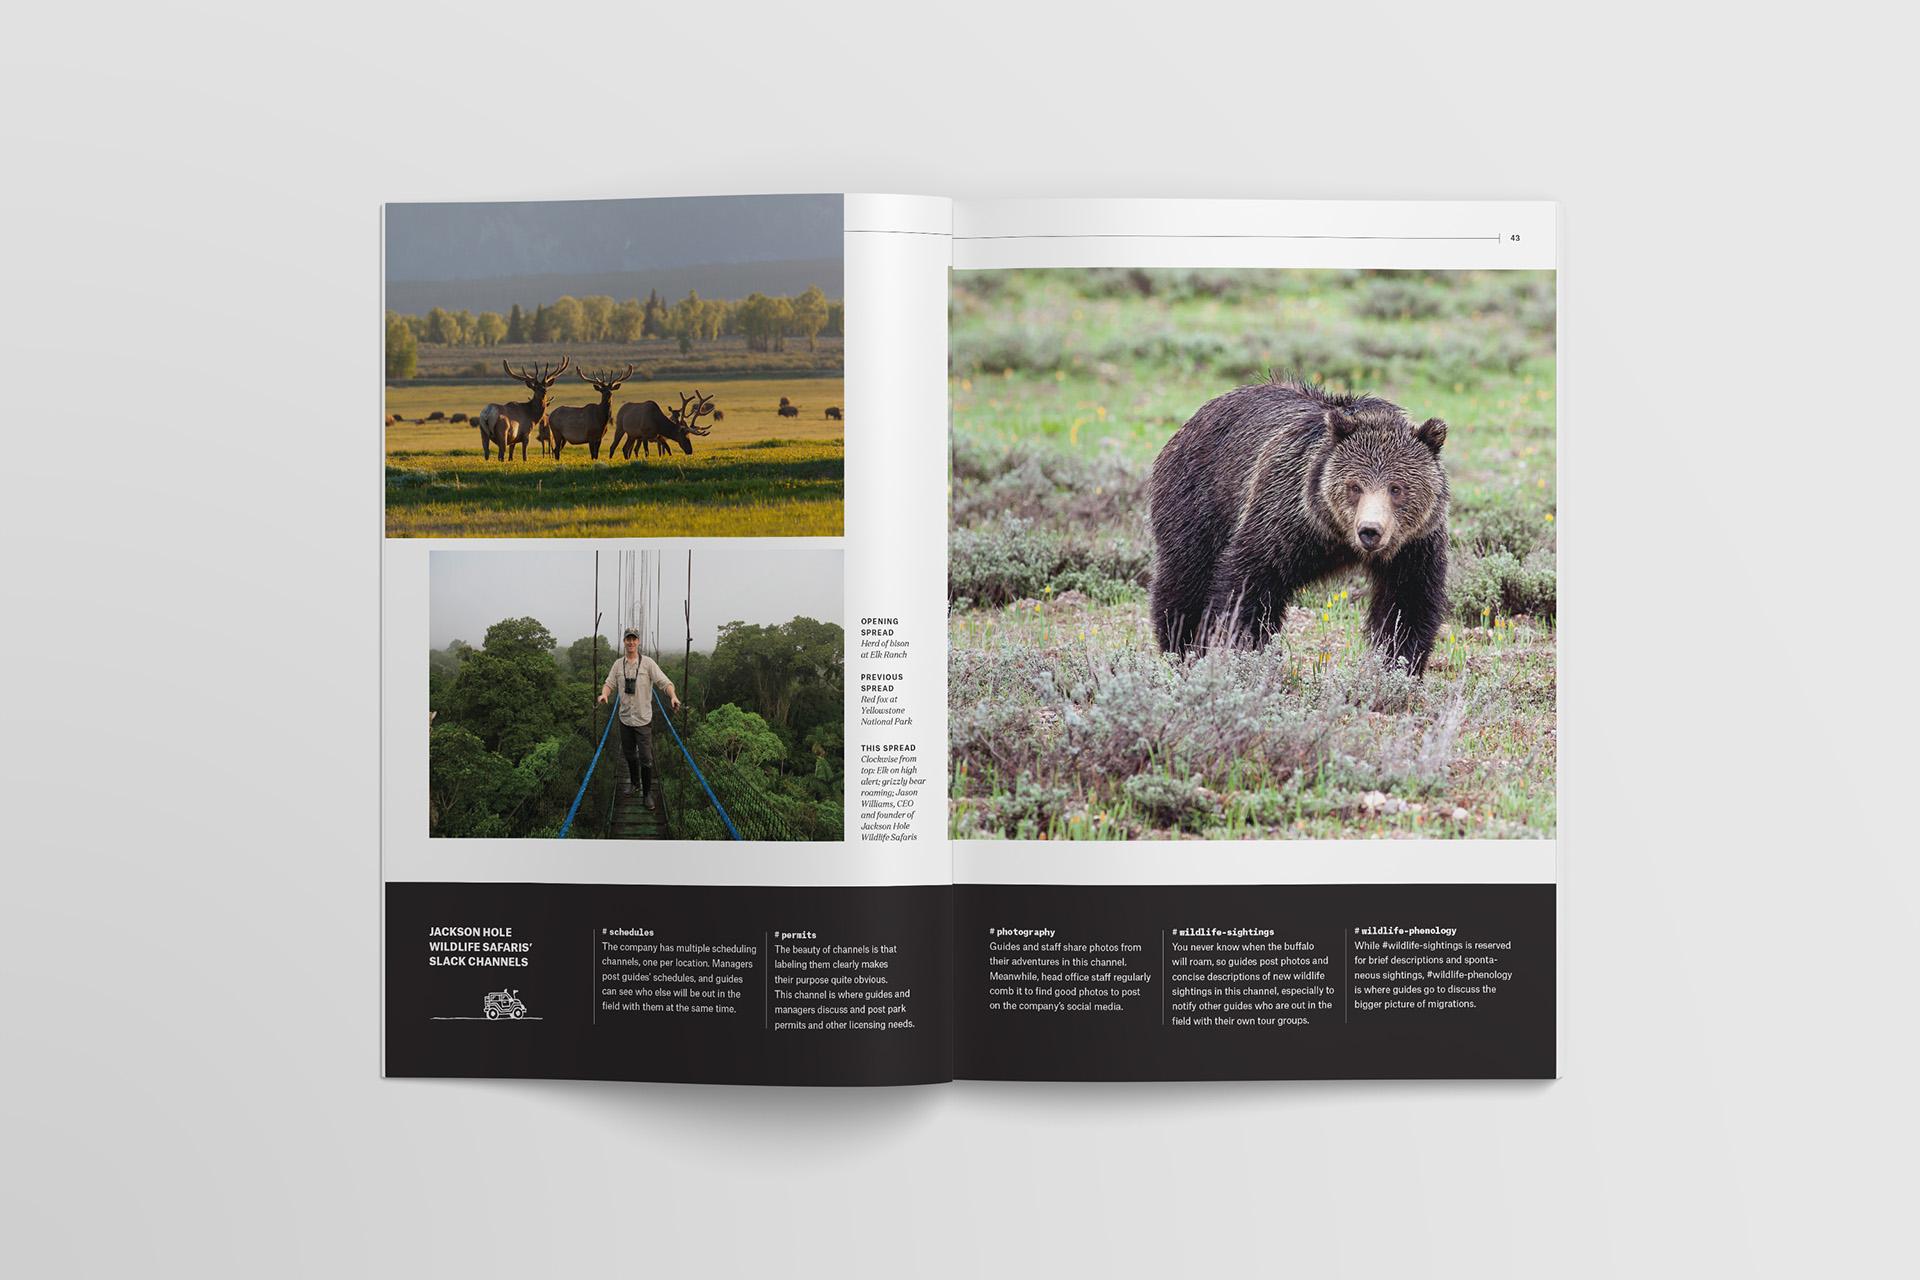 Slack Channels Wildlife Sightings Photo Essay 03